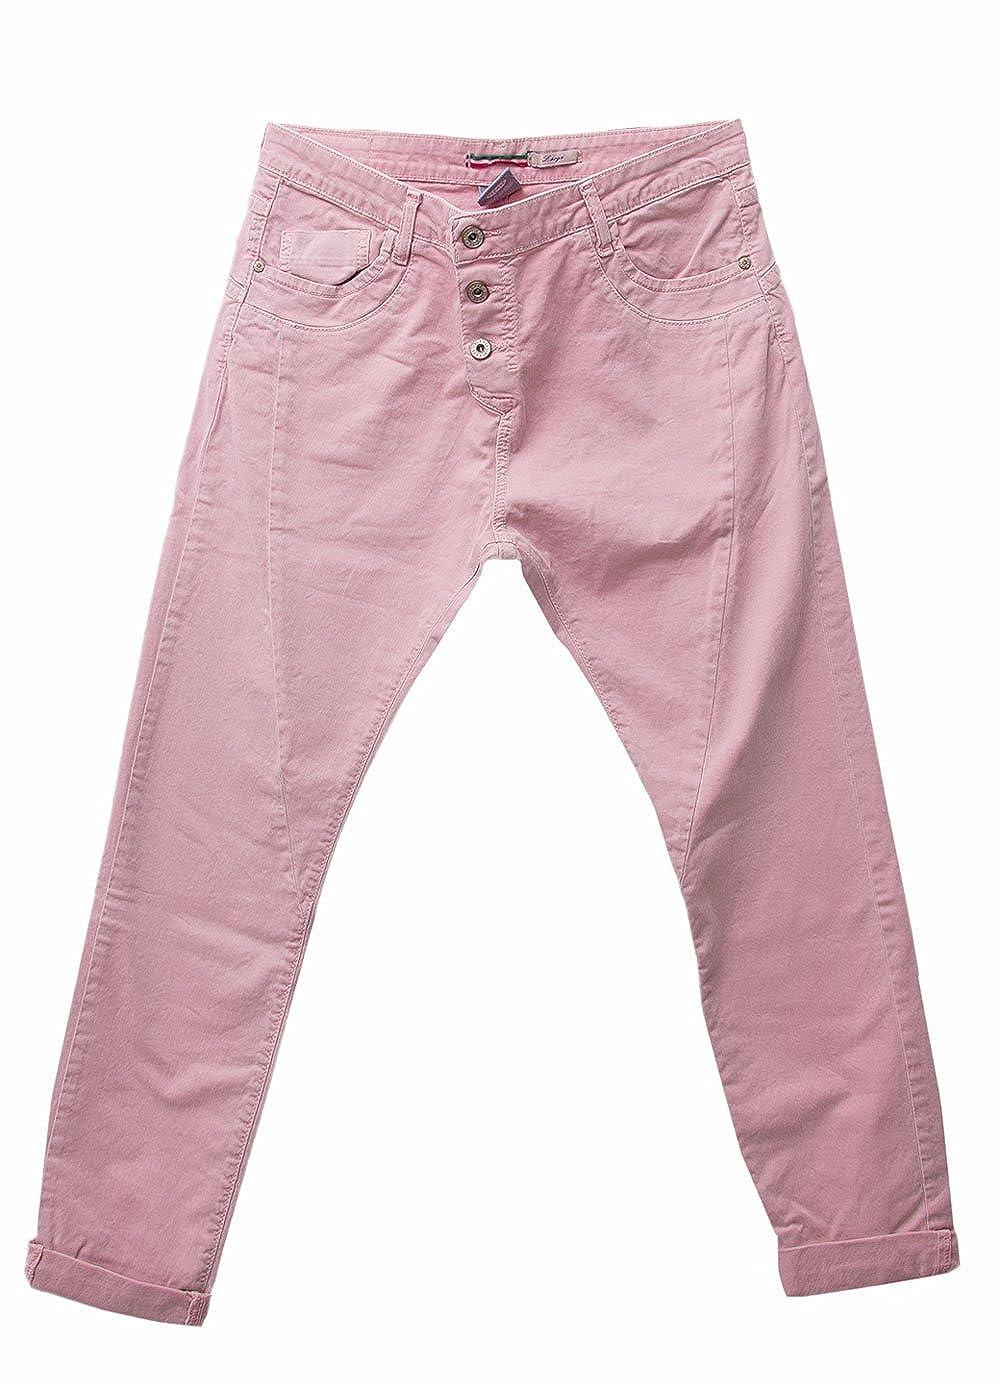 PLEASE JEANS DAMEN BAGGY BOYFRIEND P78 l pink: